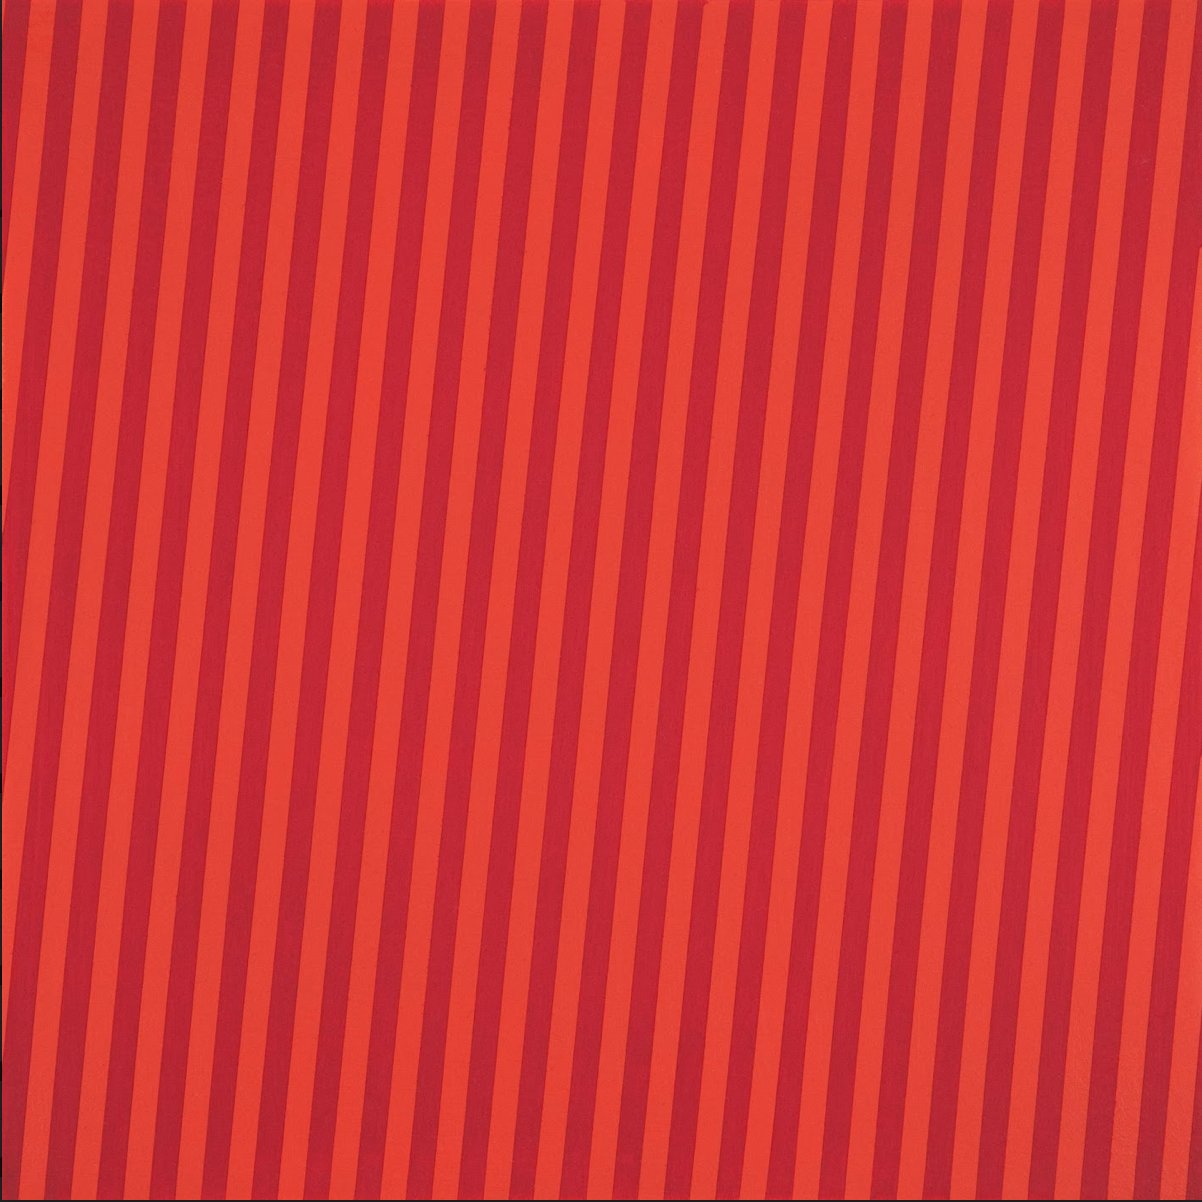 "Stripes 5, 12"" x 12"", Acrylic latex on panel, 2015"